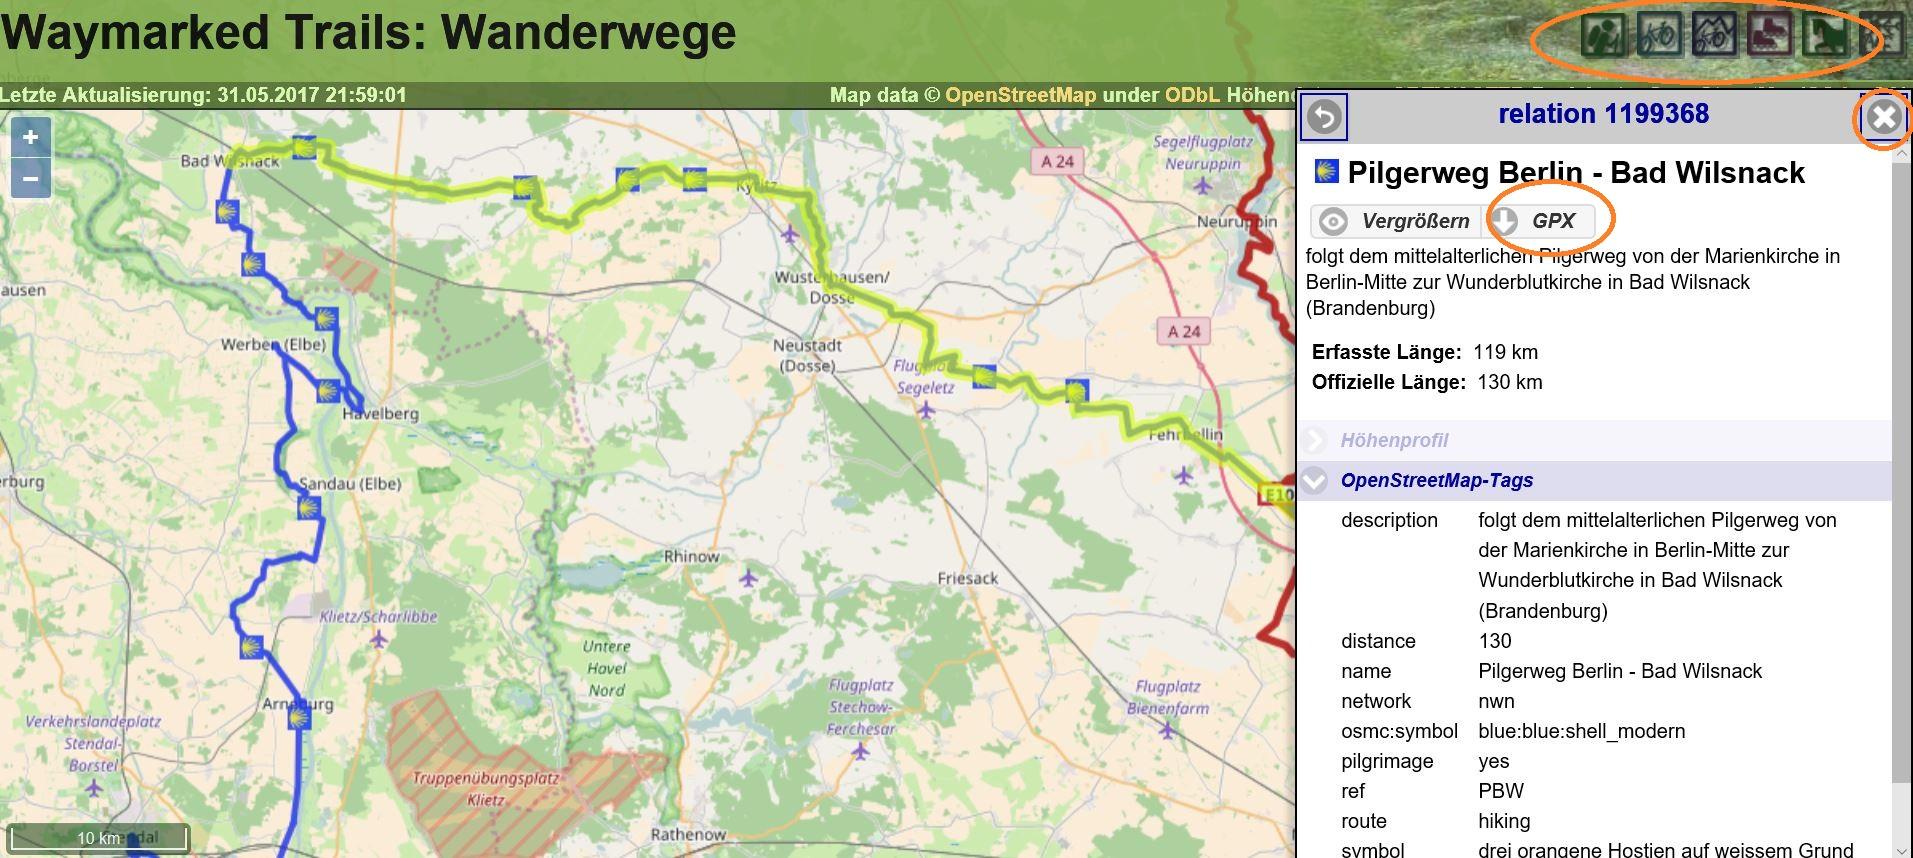 gps-Daten mit MapSource bearbeiten